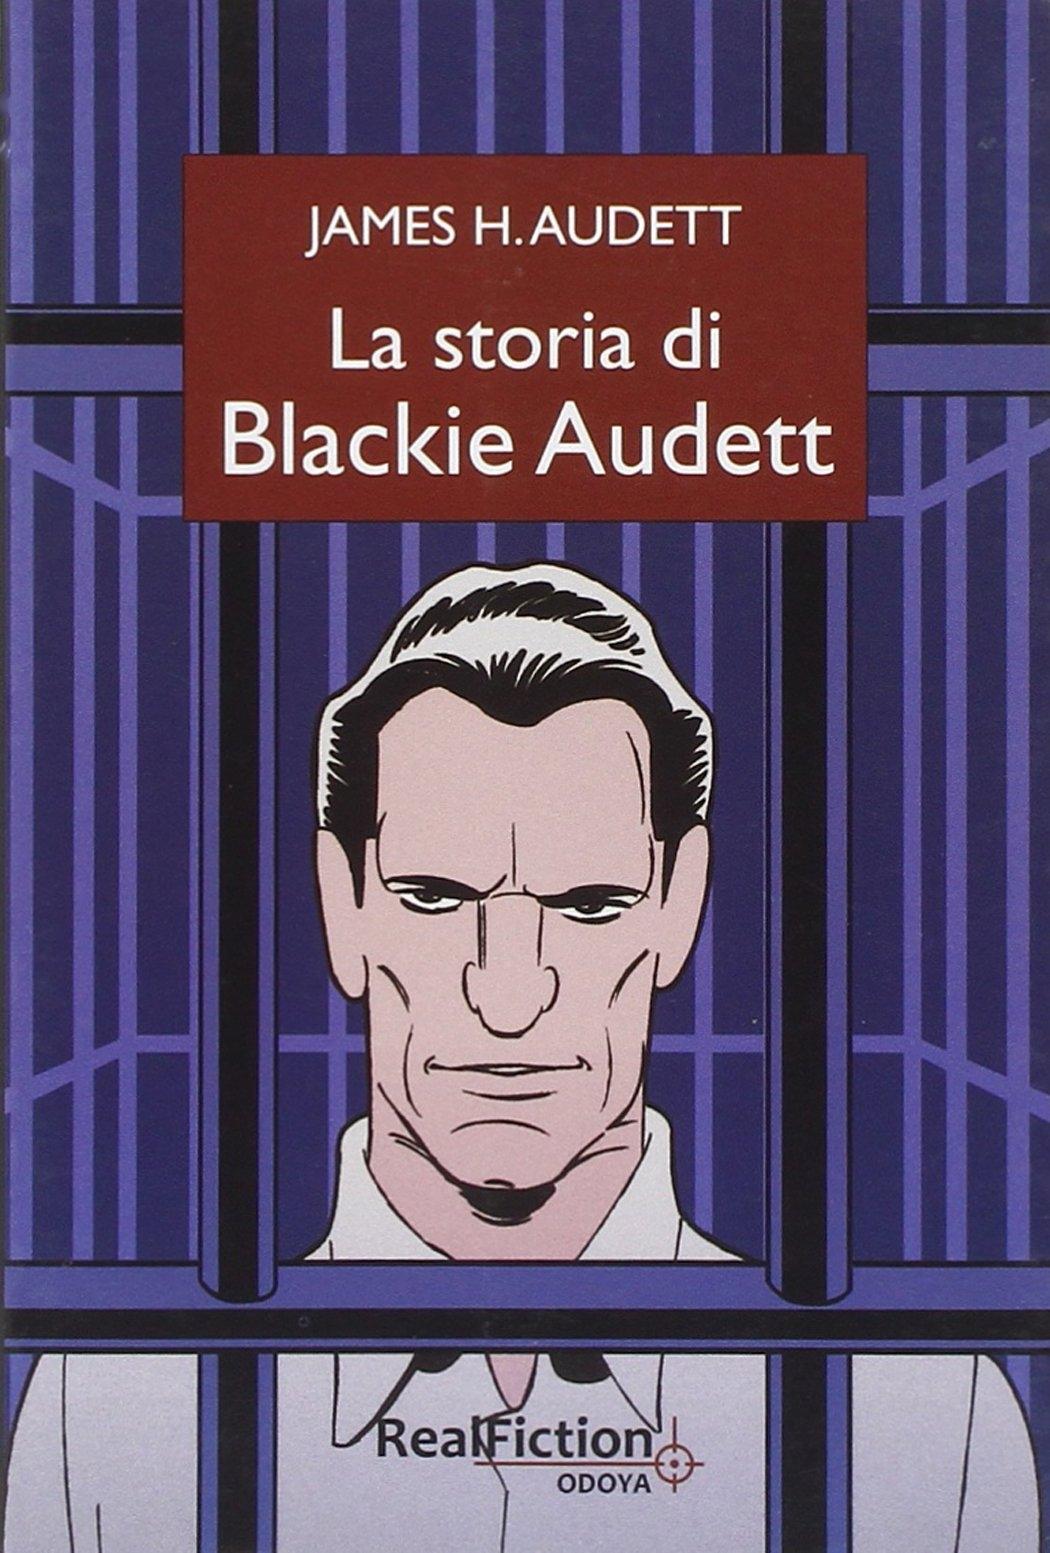 La storia di Blackie Audett.